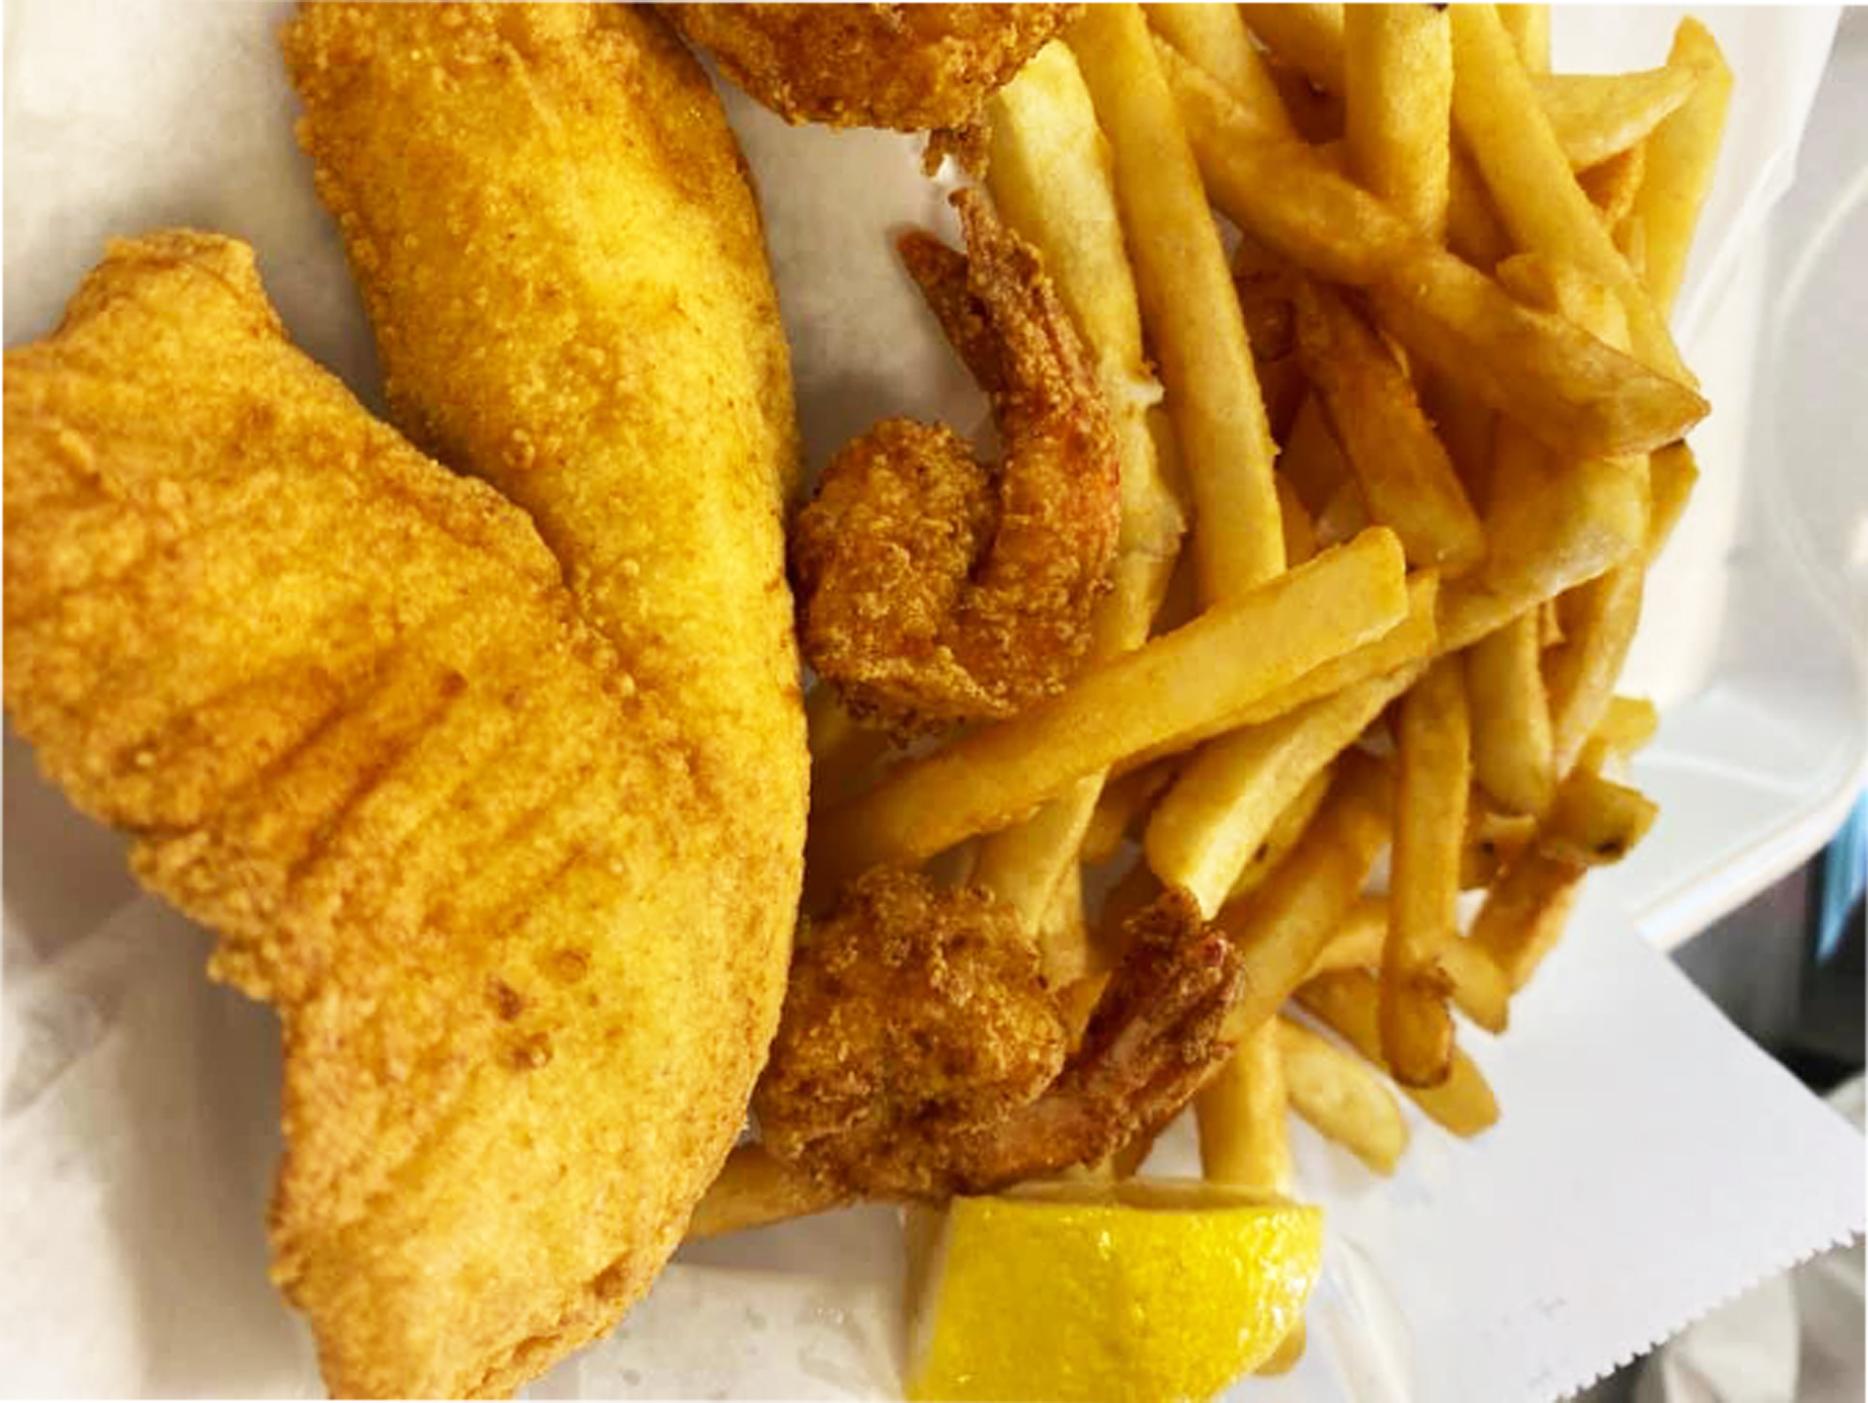 1Pc Tilapia or Catfish & 3 Shrimp